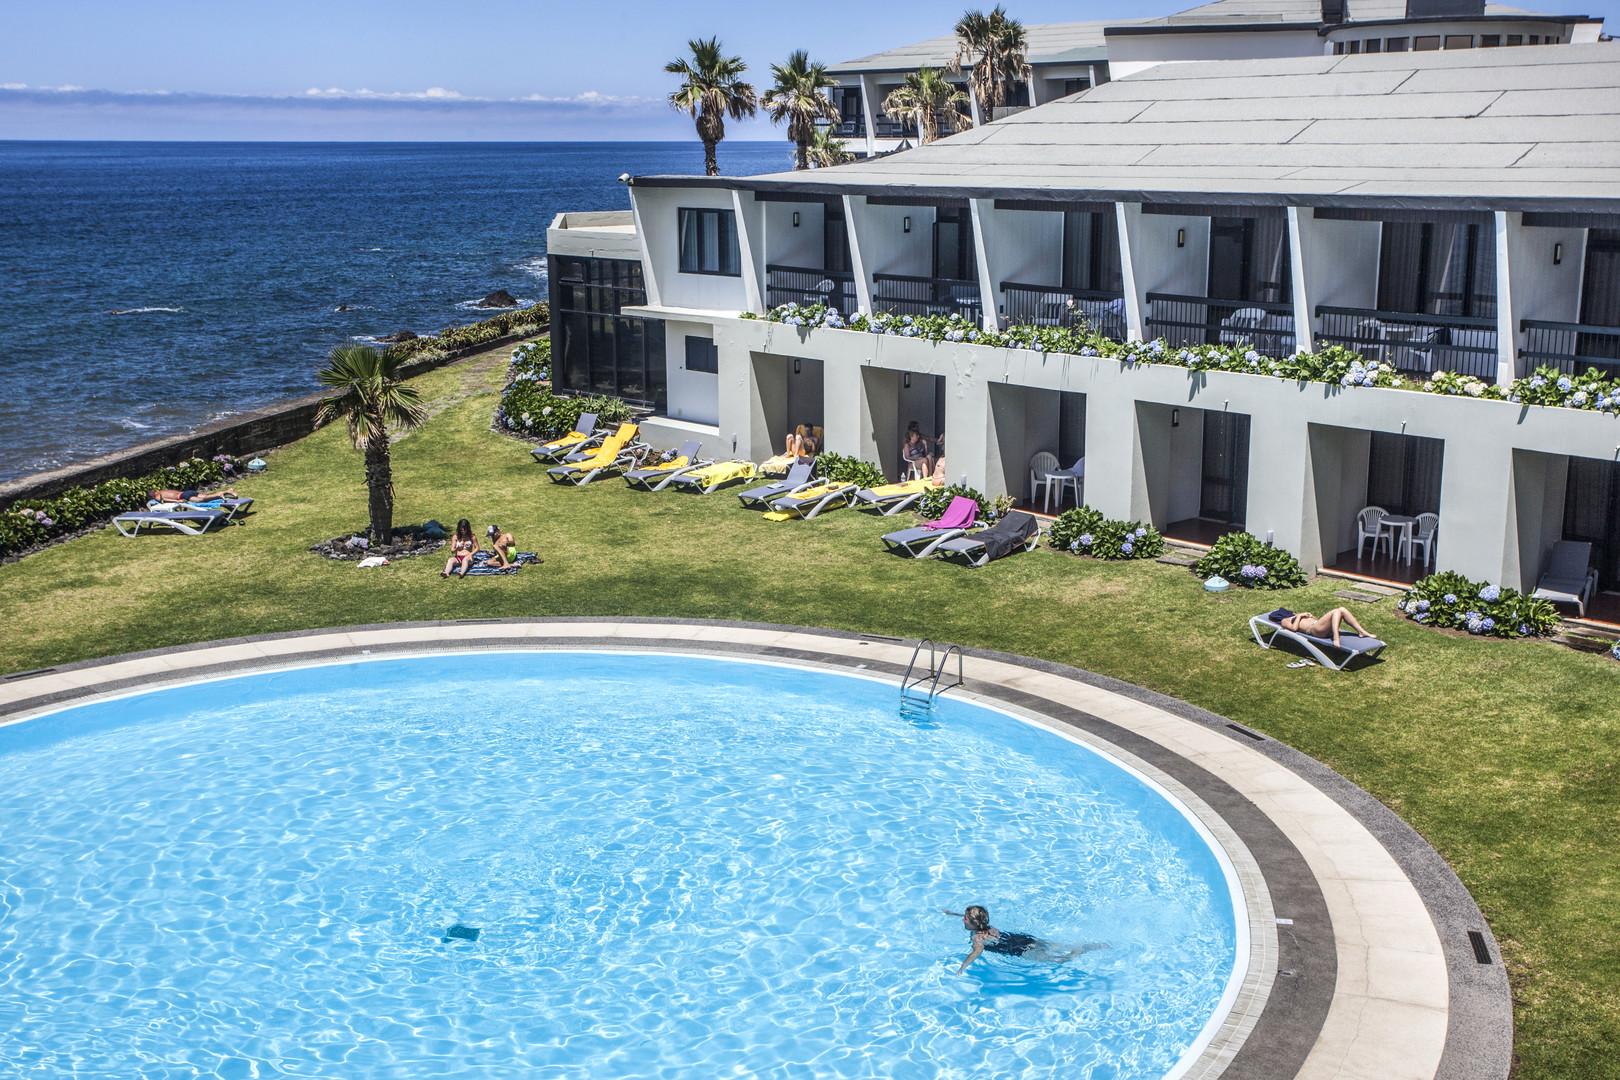 Hotel Estalagem Do Mar #2